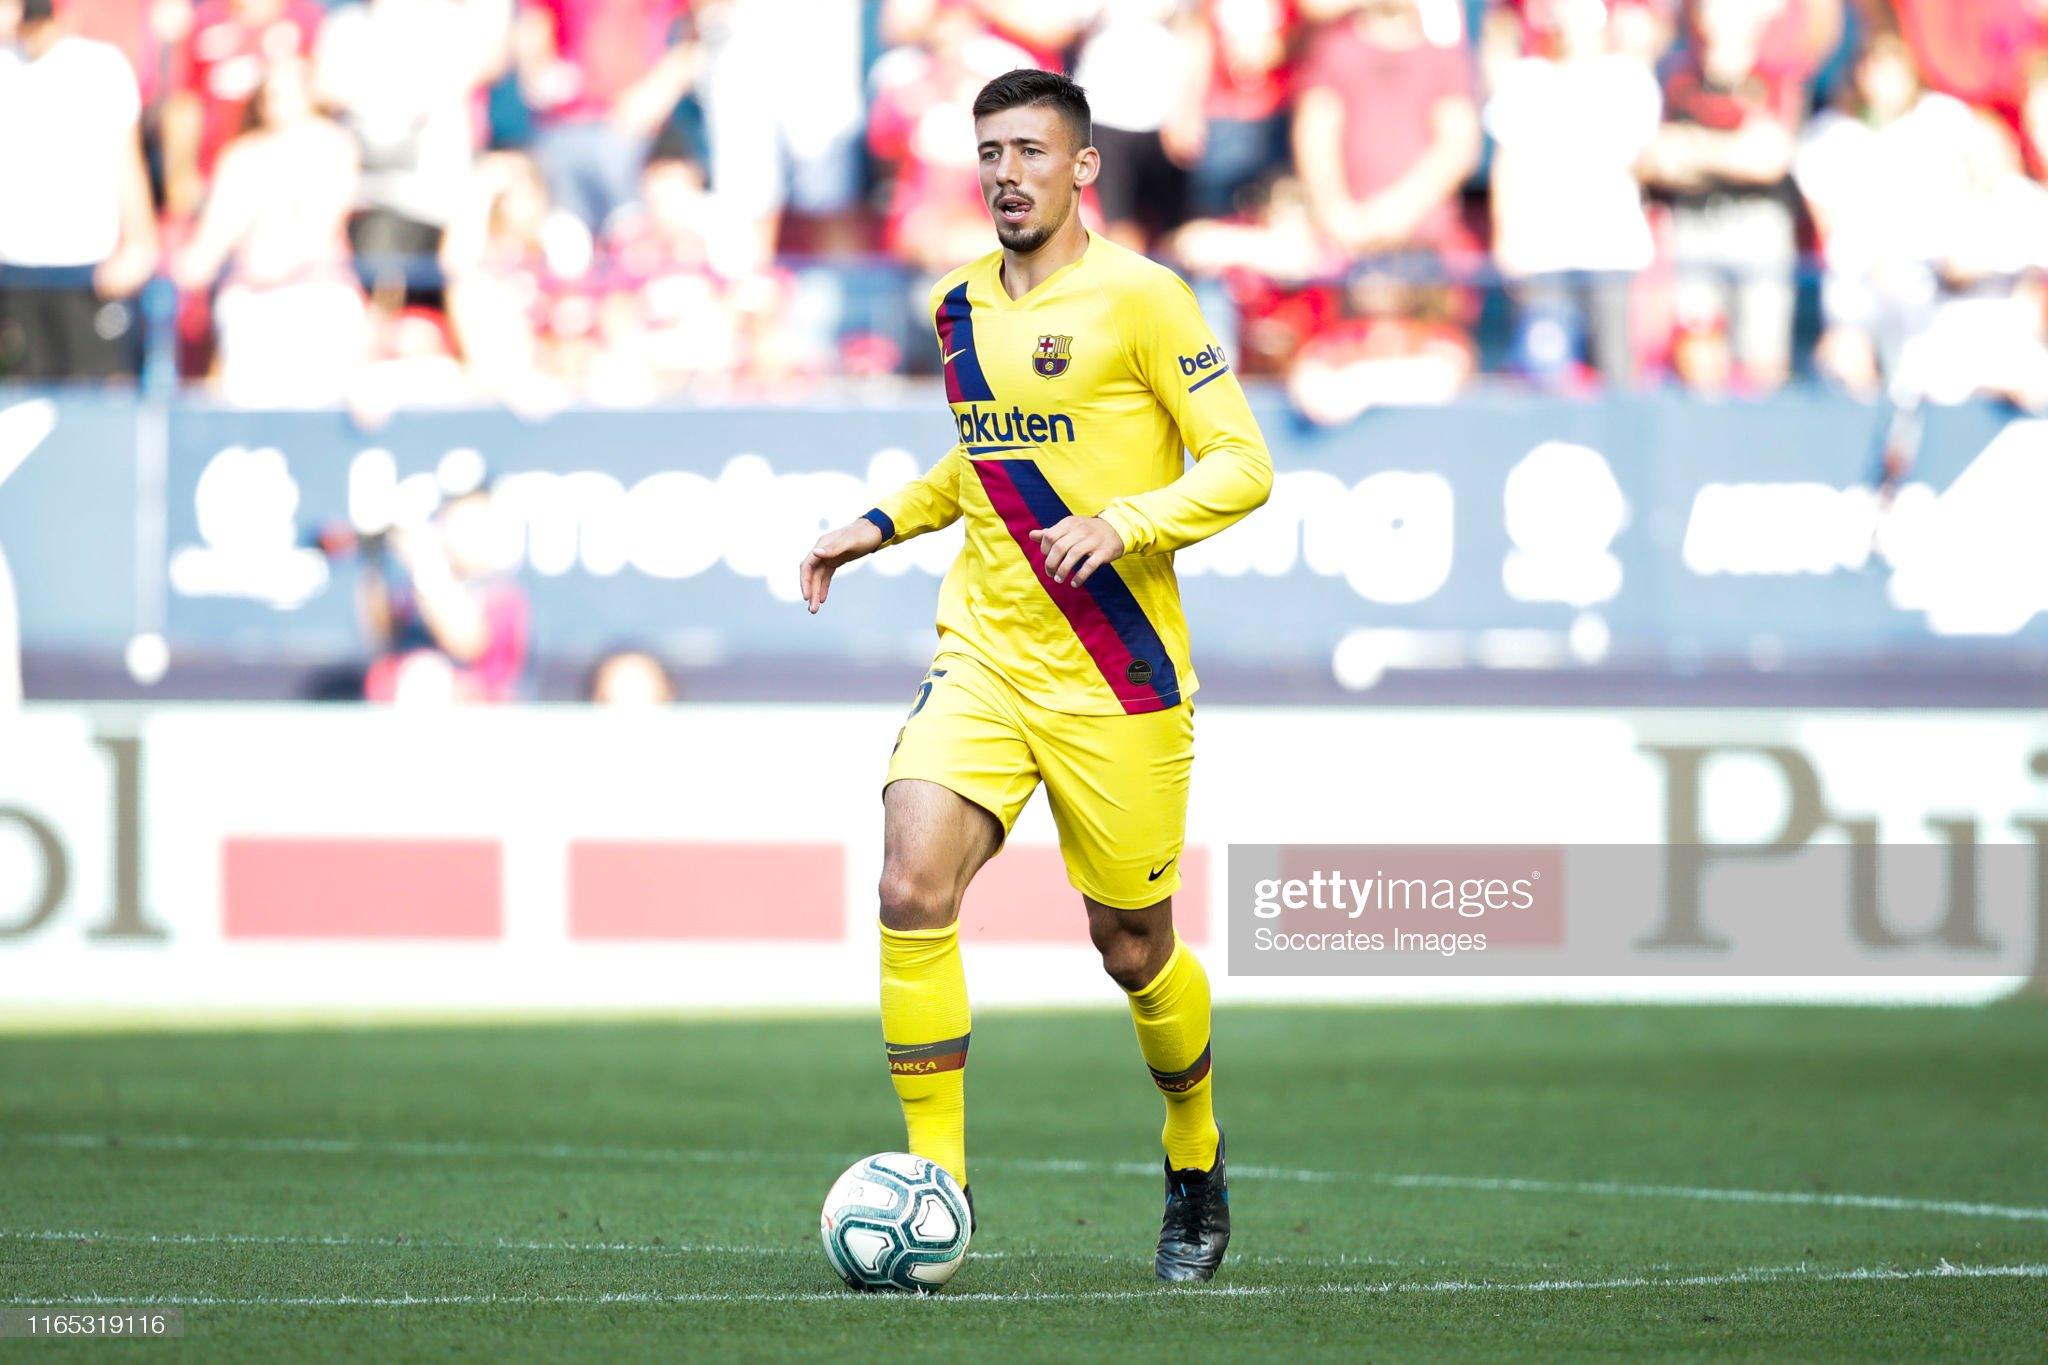 صور مباراة : أوساسونا - برشلونة 2-2 ( 31-08-2019 )  Clement-lenglet-of-fc-barcelona-during-the-la-liga-santander-match-picture-id1165319116?s=2048x2048